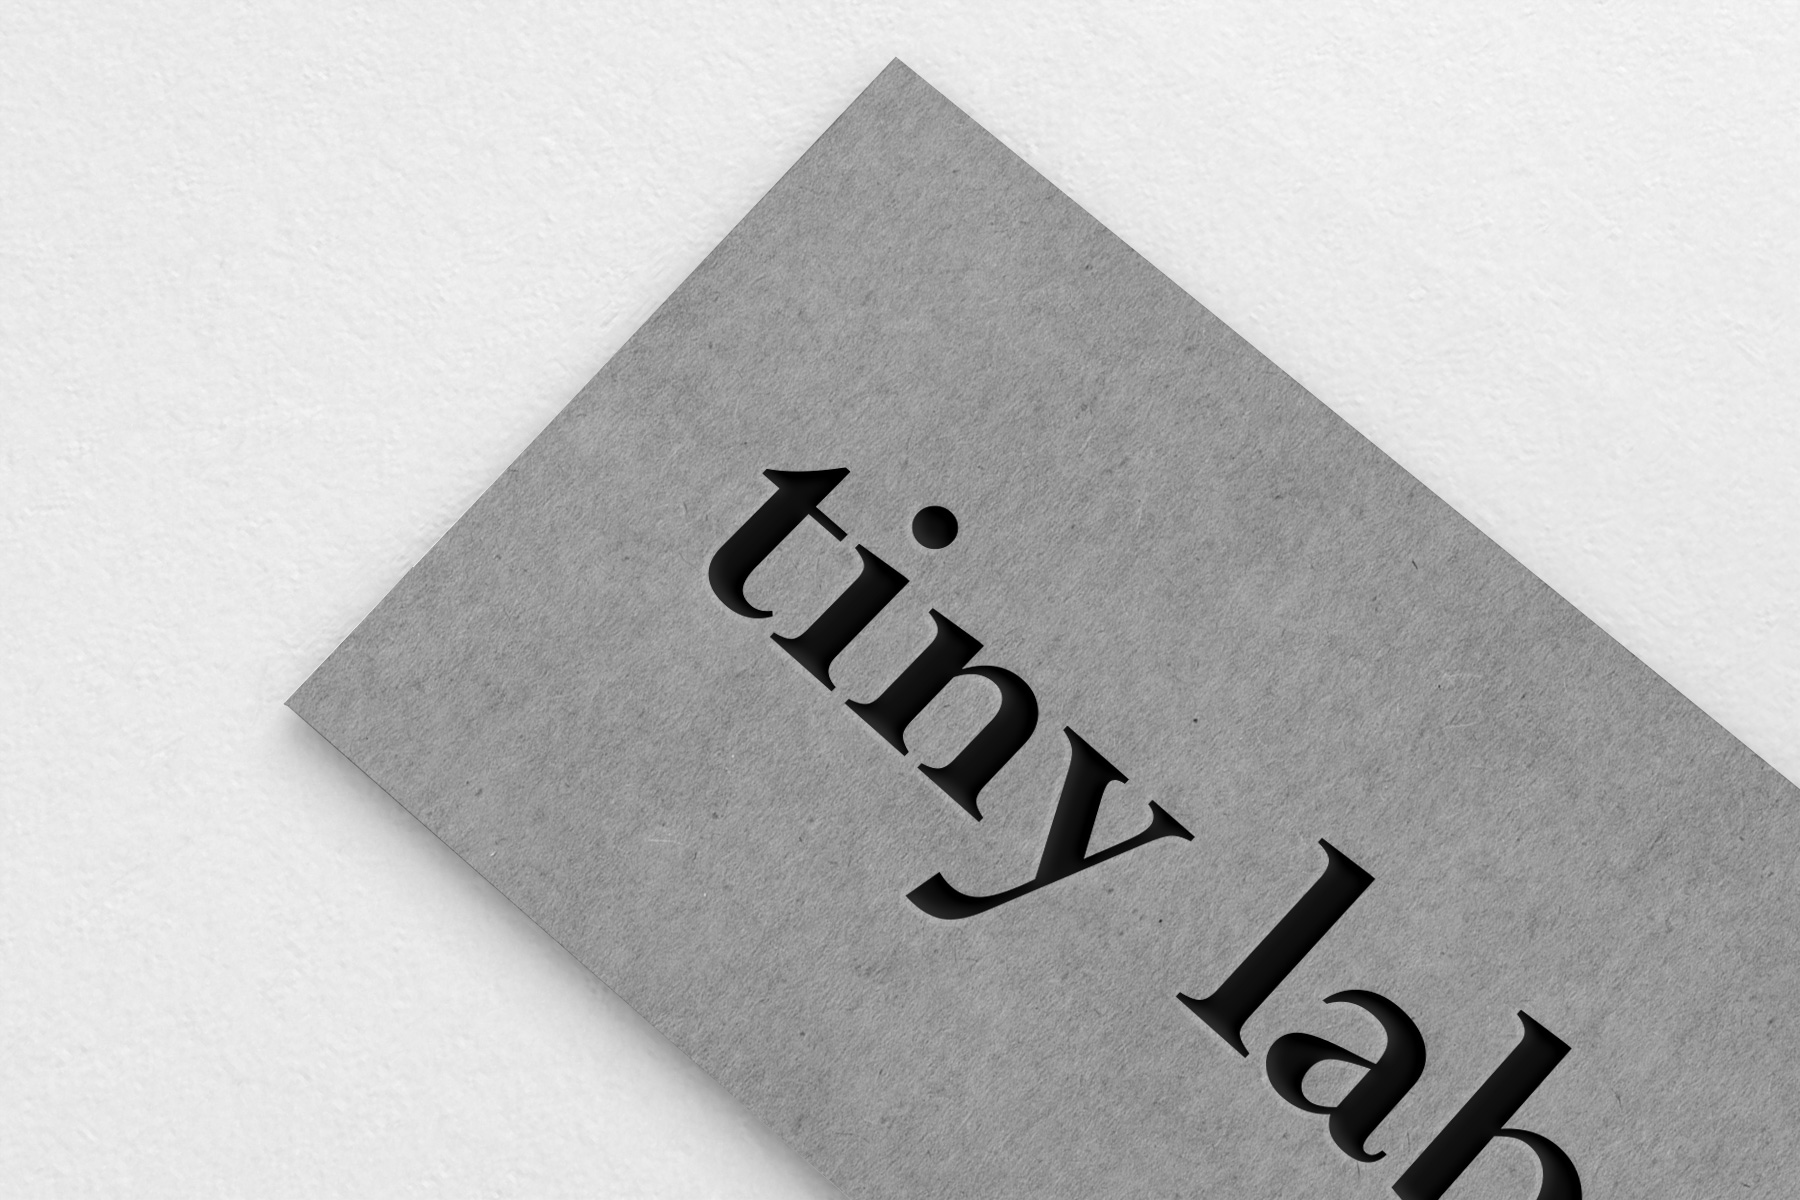 tinylab-02